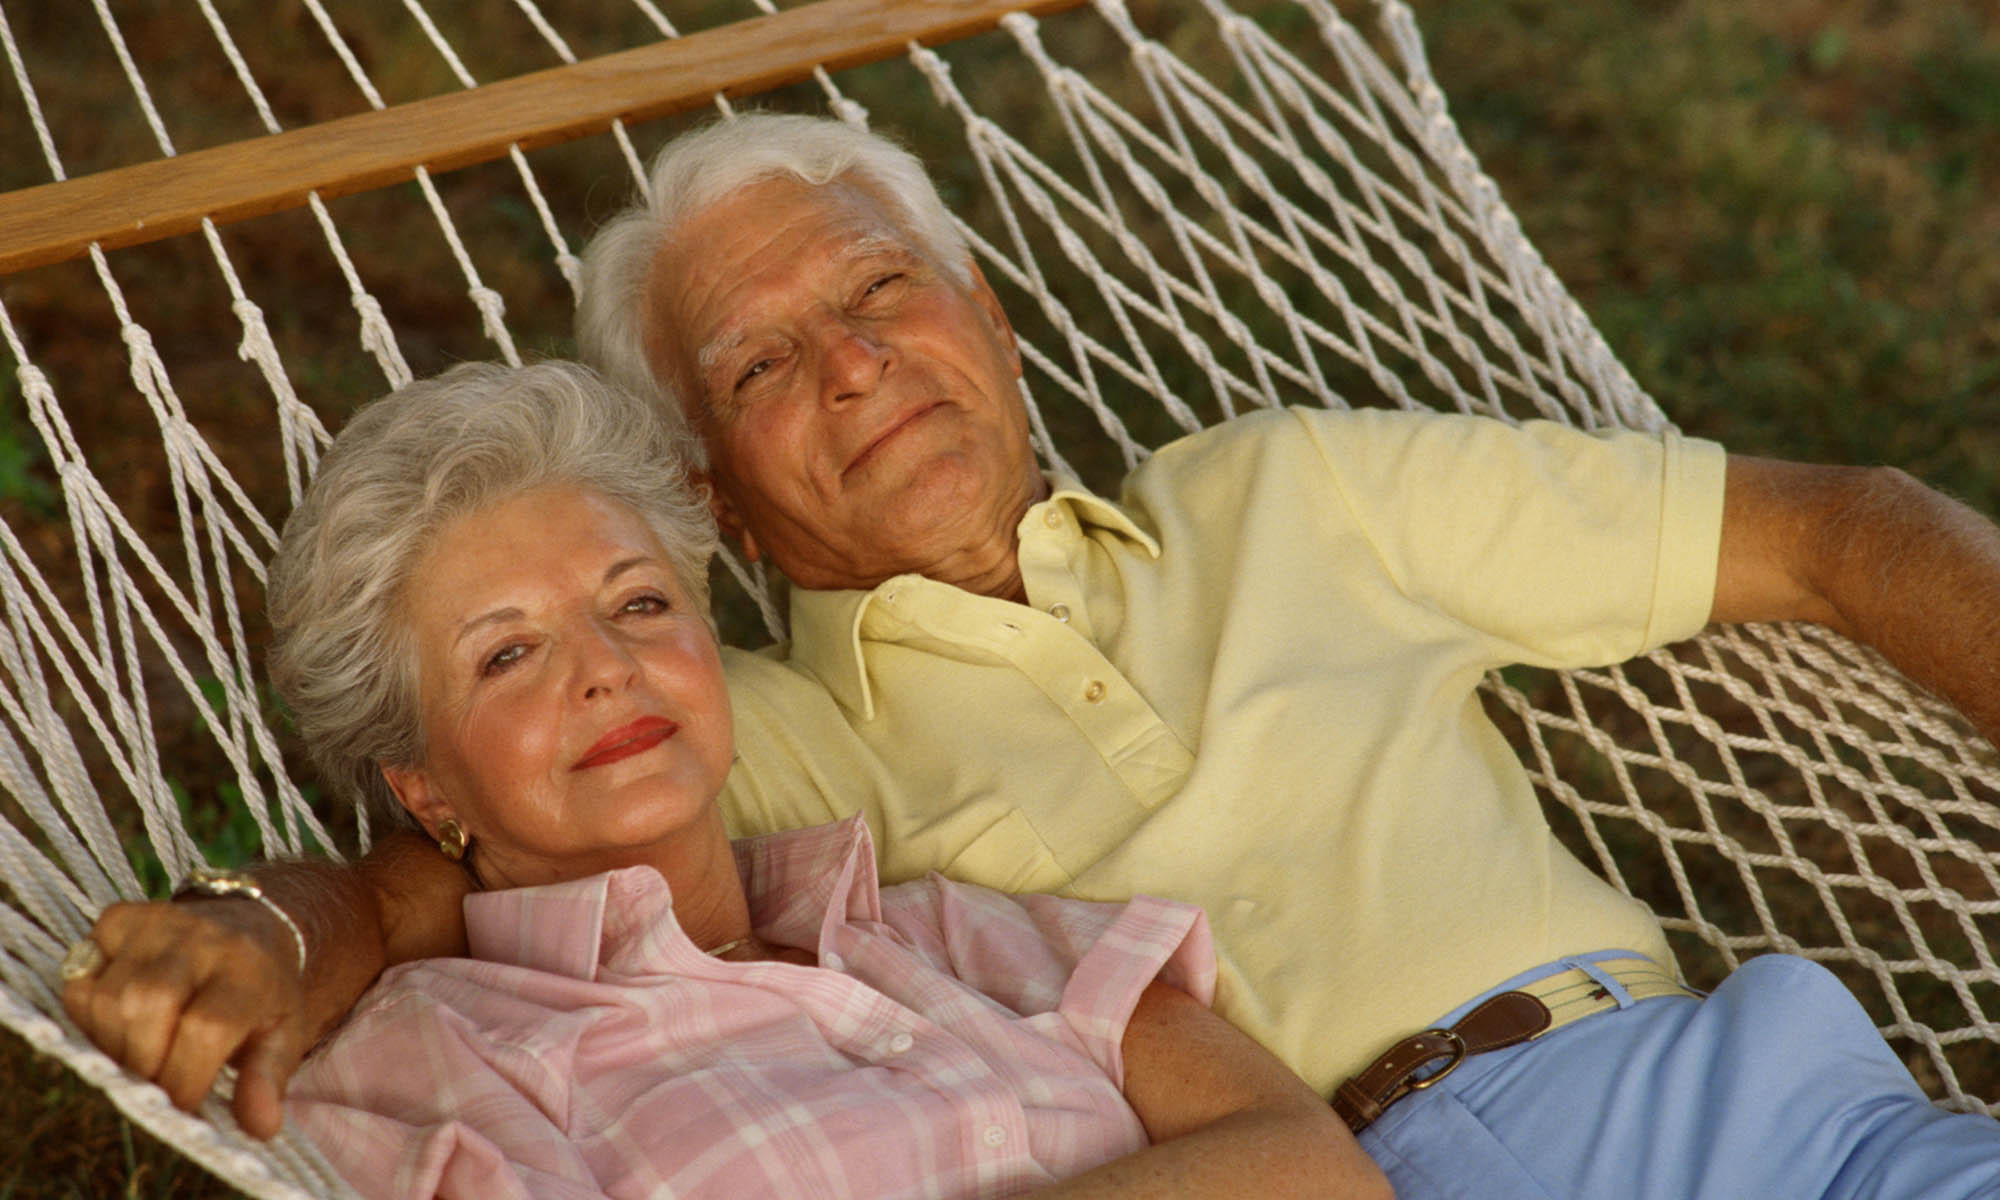 Senior couple in a hammock